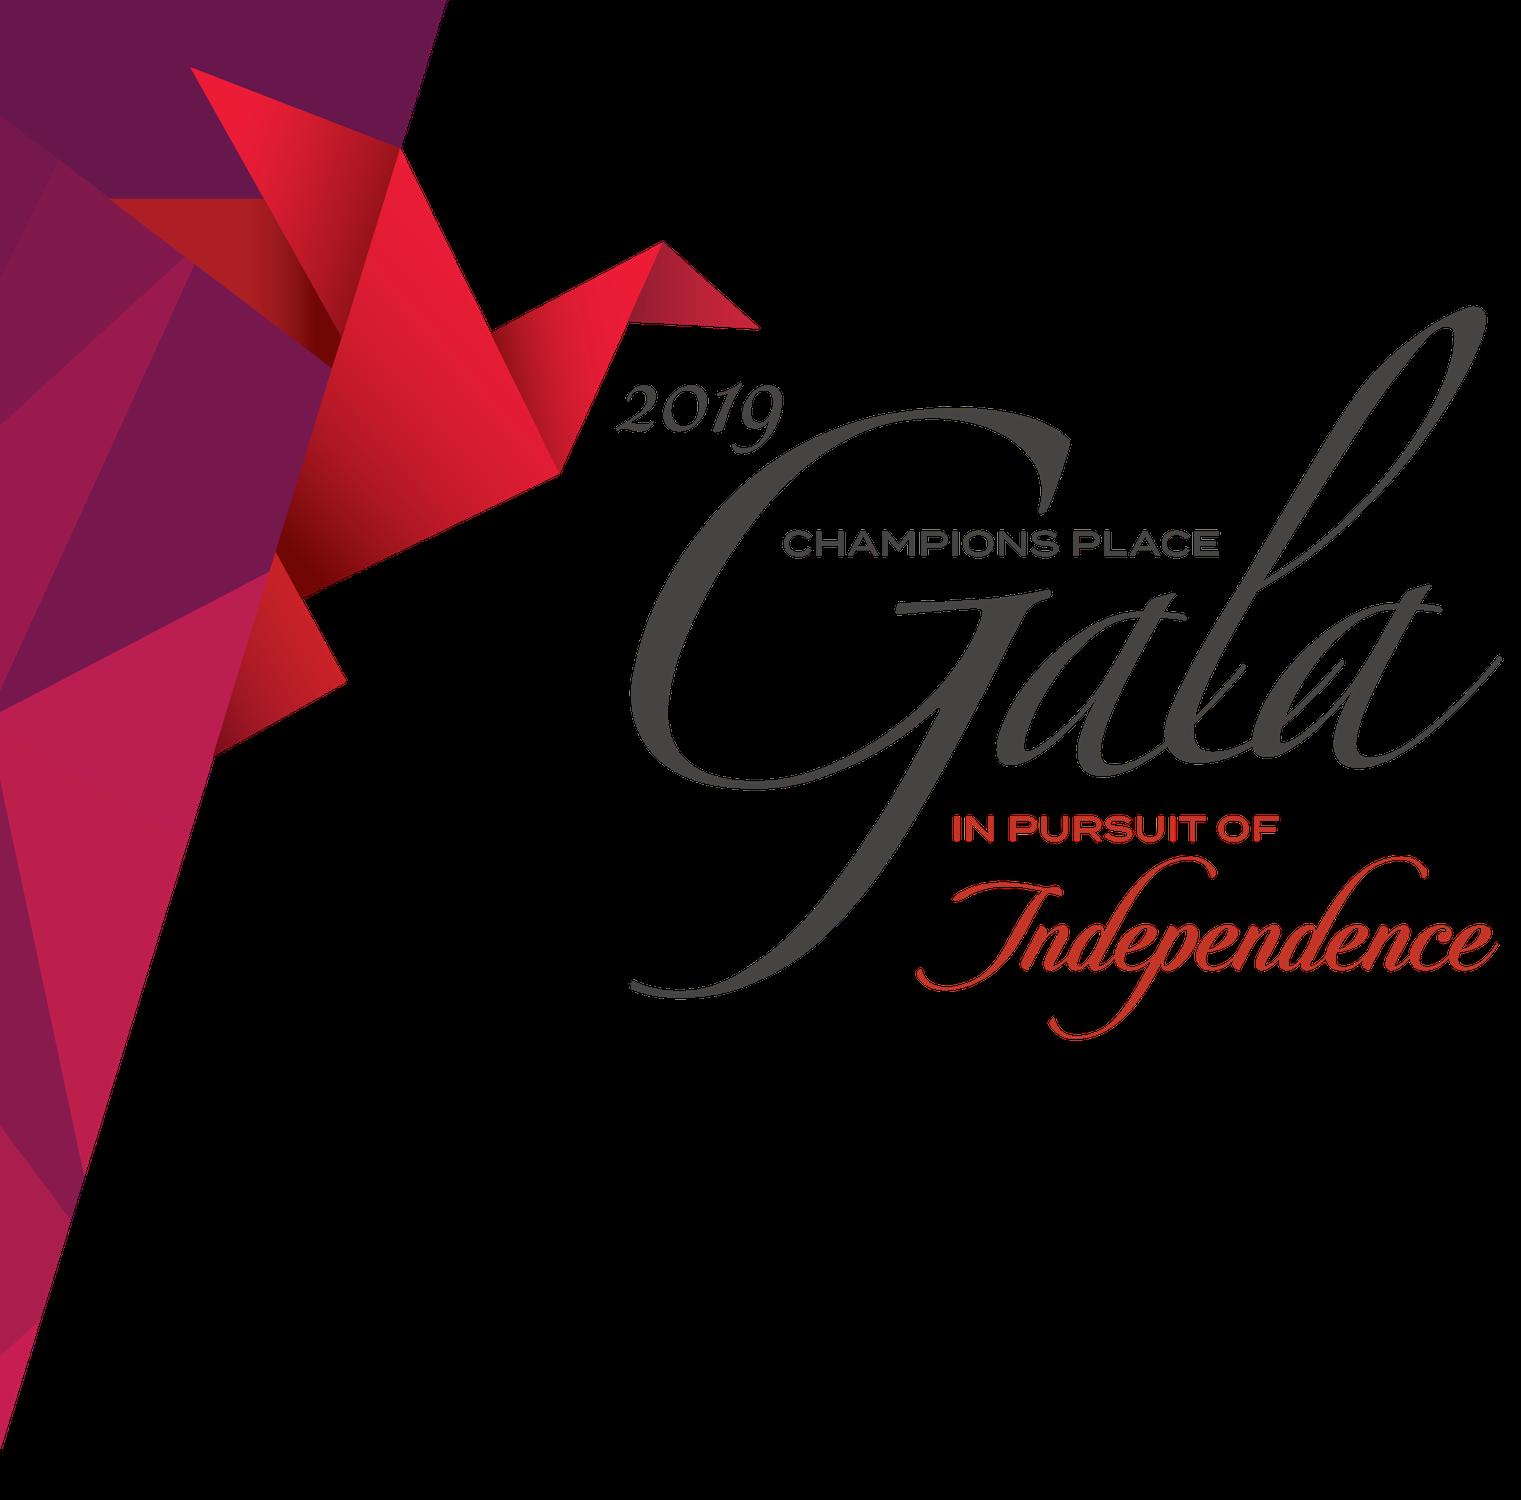 Complete_Gala_logo_2 web version.png